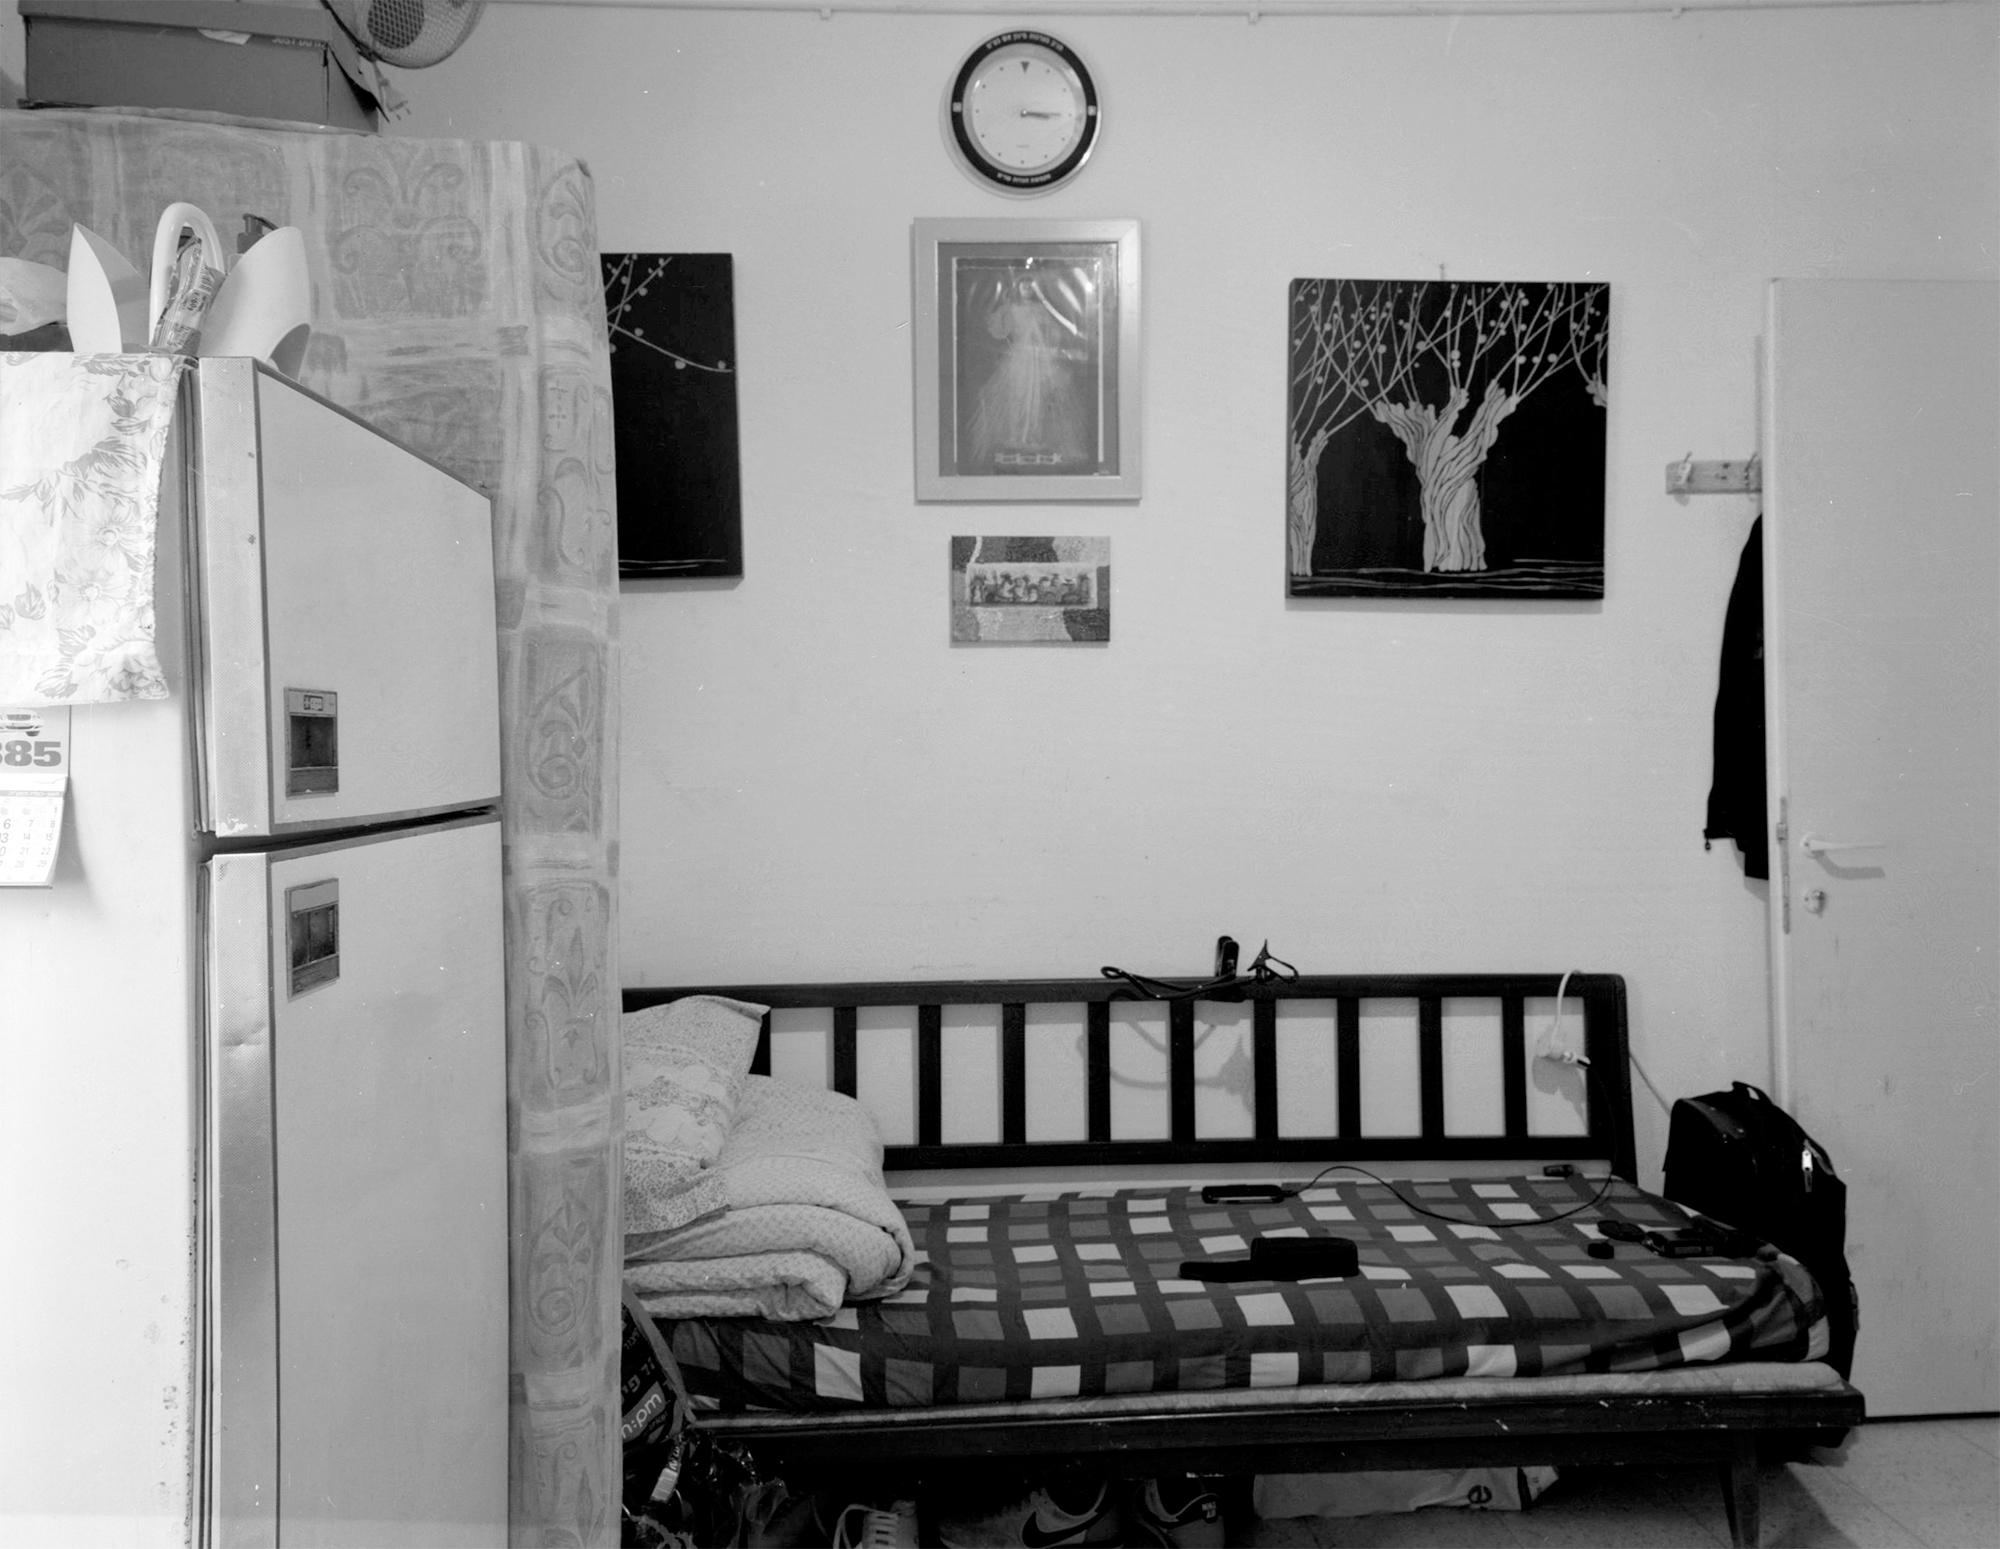 J. living room, Neve Sha'anan 2014